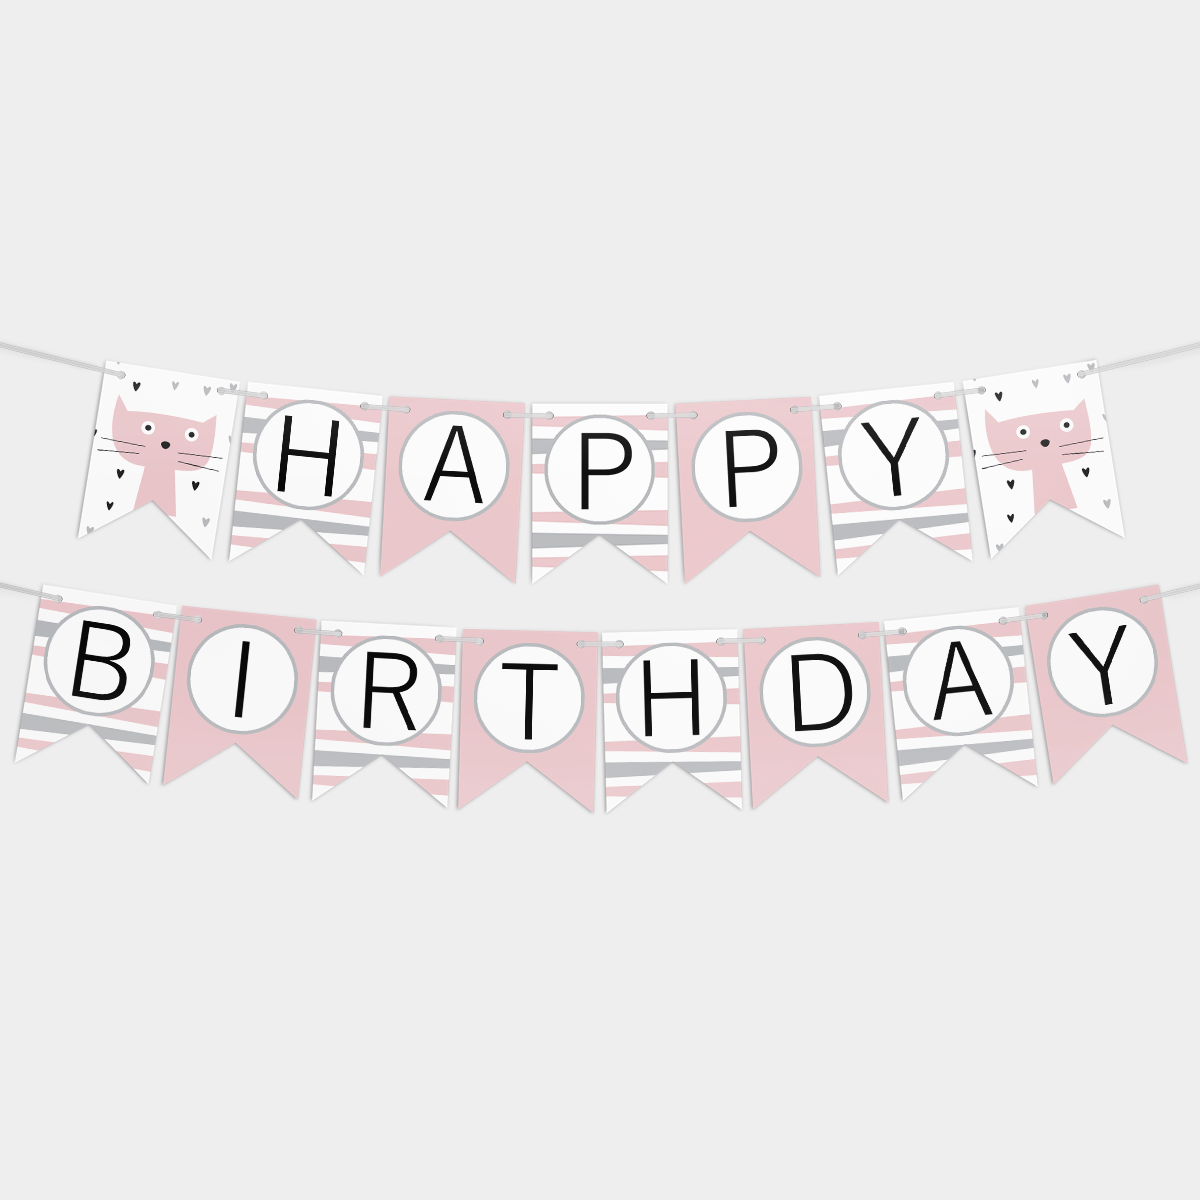 Гирлянда бумажная Happy birthday Розовая с кошечками